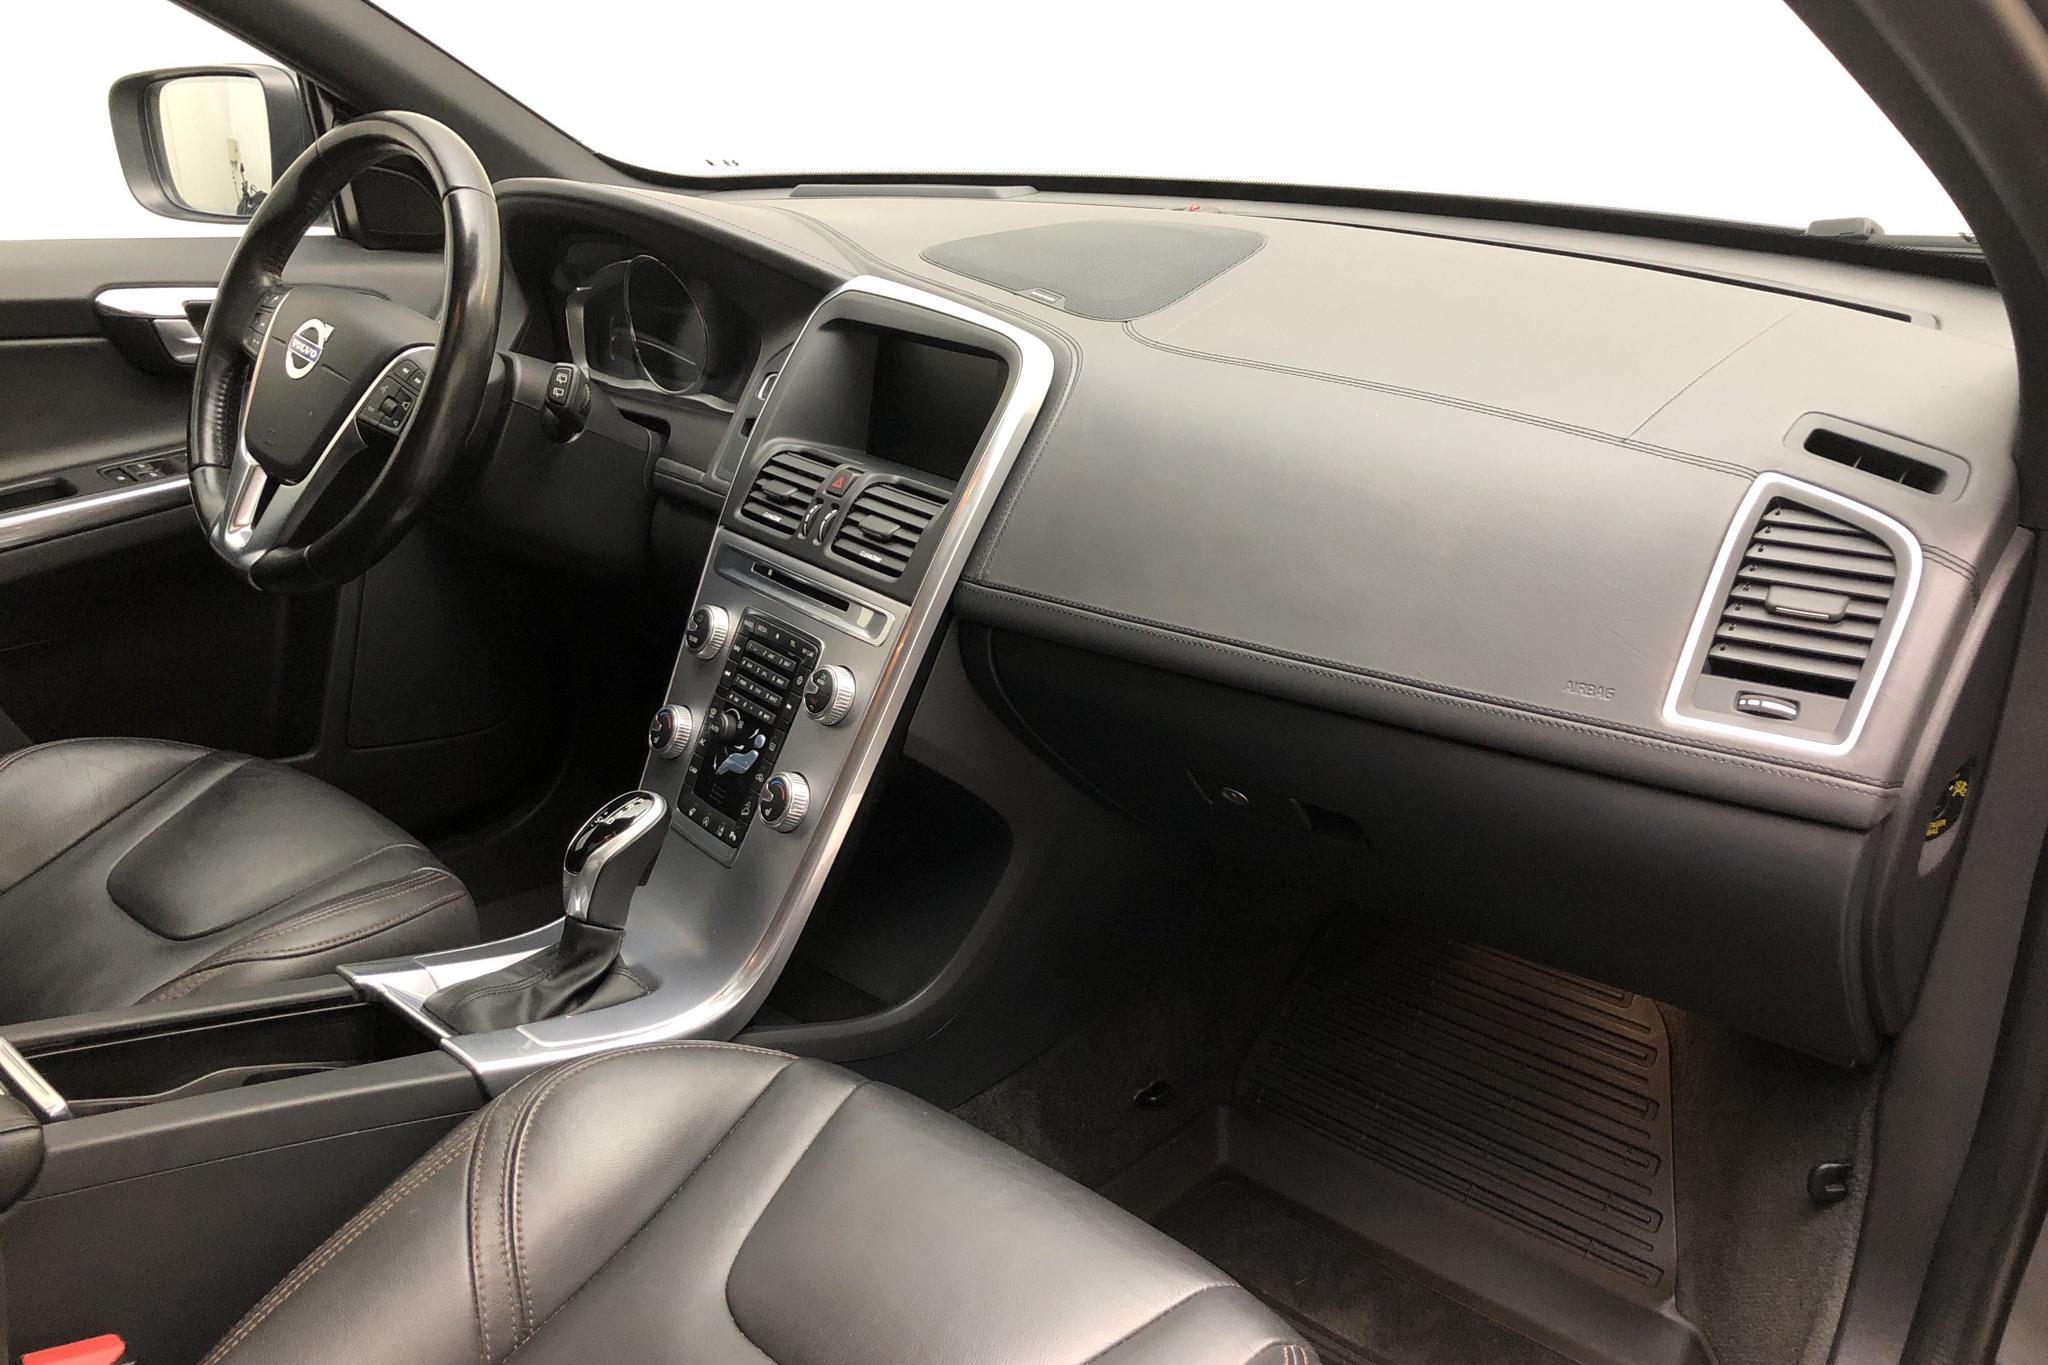 Volvo XC60 D4 AWD (190hk) - 111 790 km - Automatic - gray - 2017